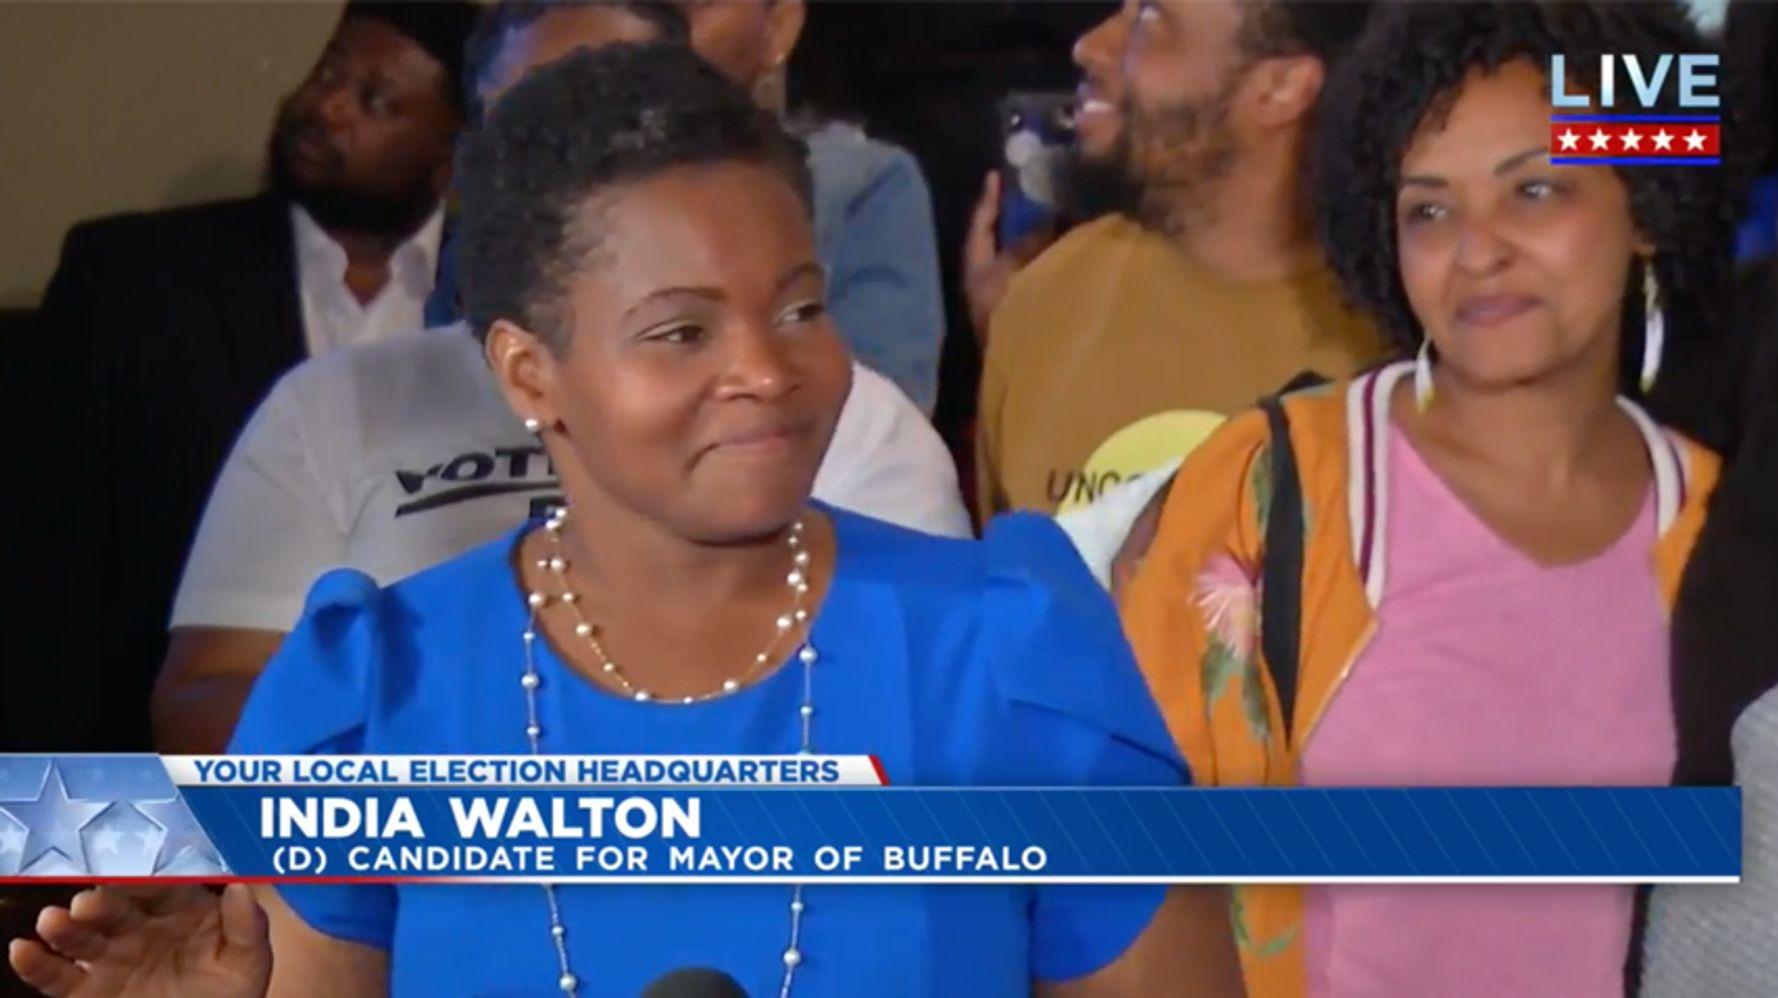 India Walton Poised To Become Buffalo's First Socialist Mayor